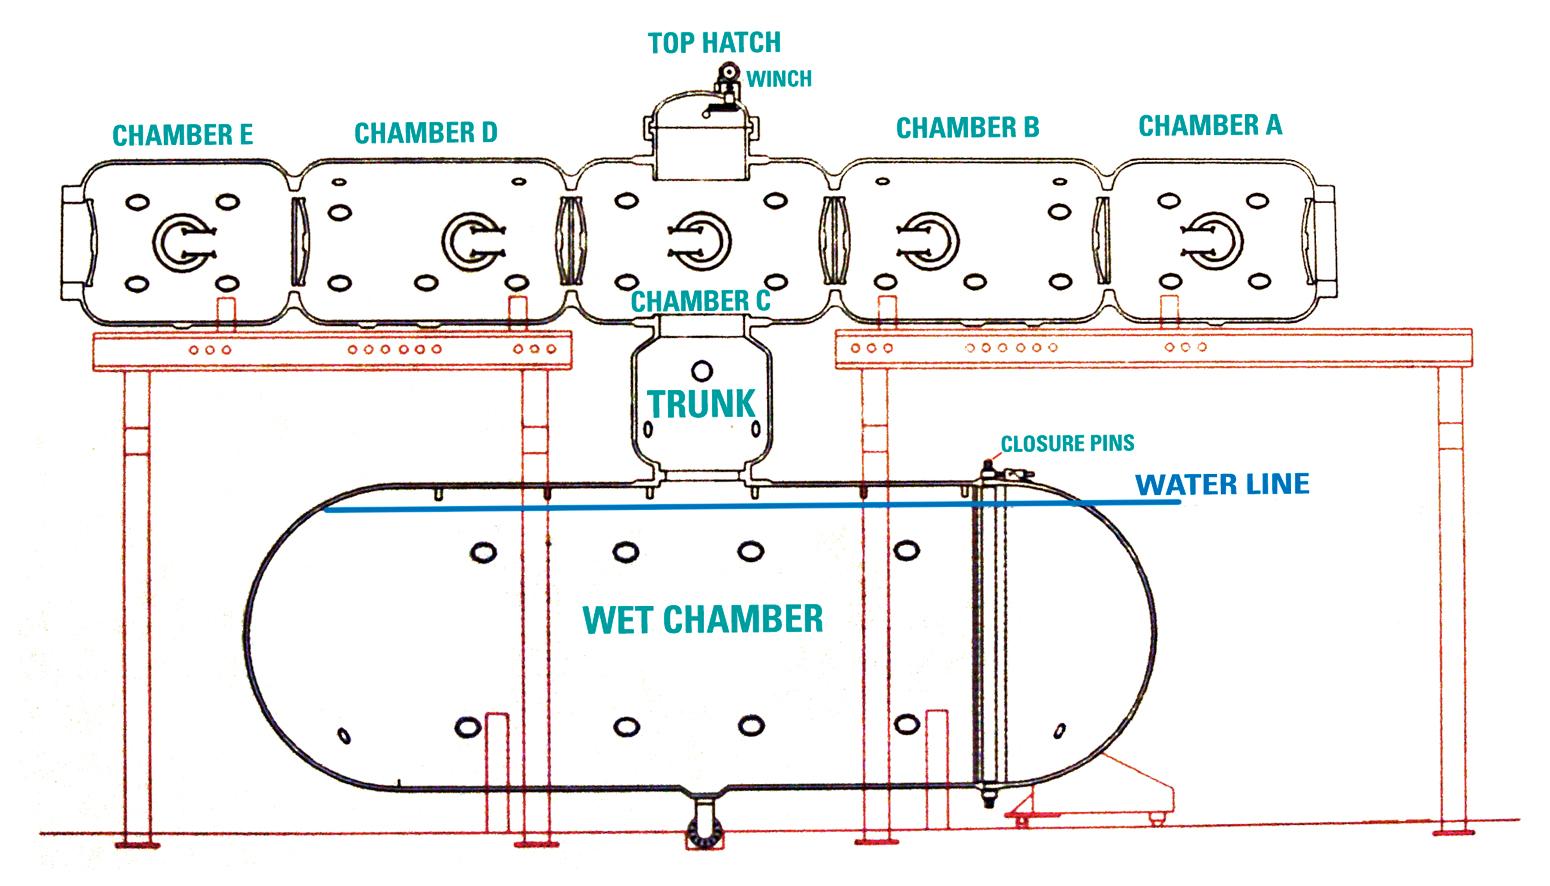 scuba gear diagram kenmore washer wiring file wet chamber jpg wikimedia commons